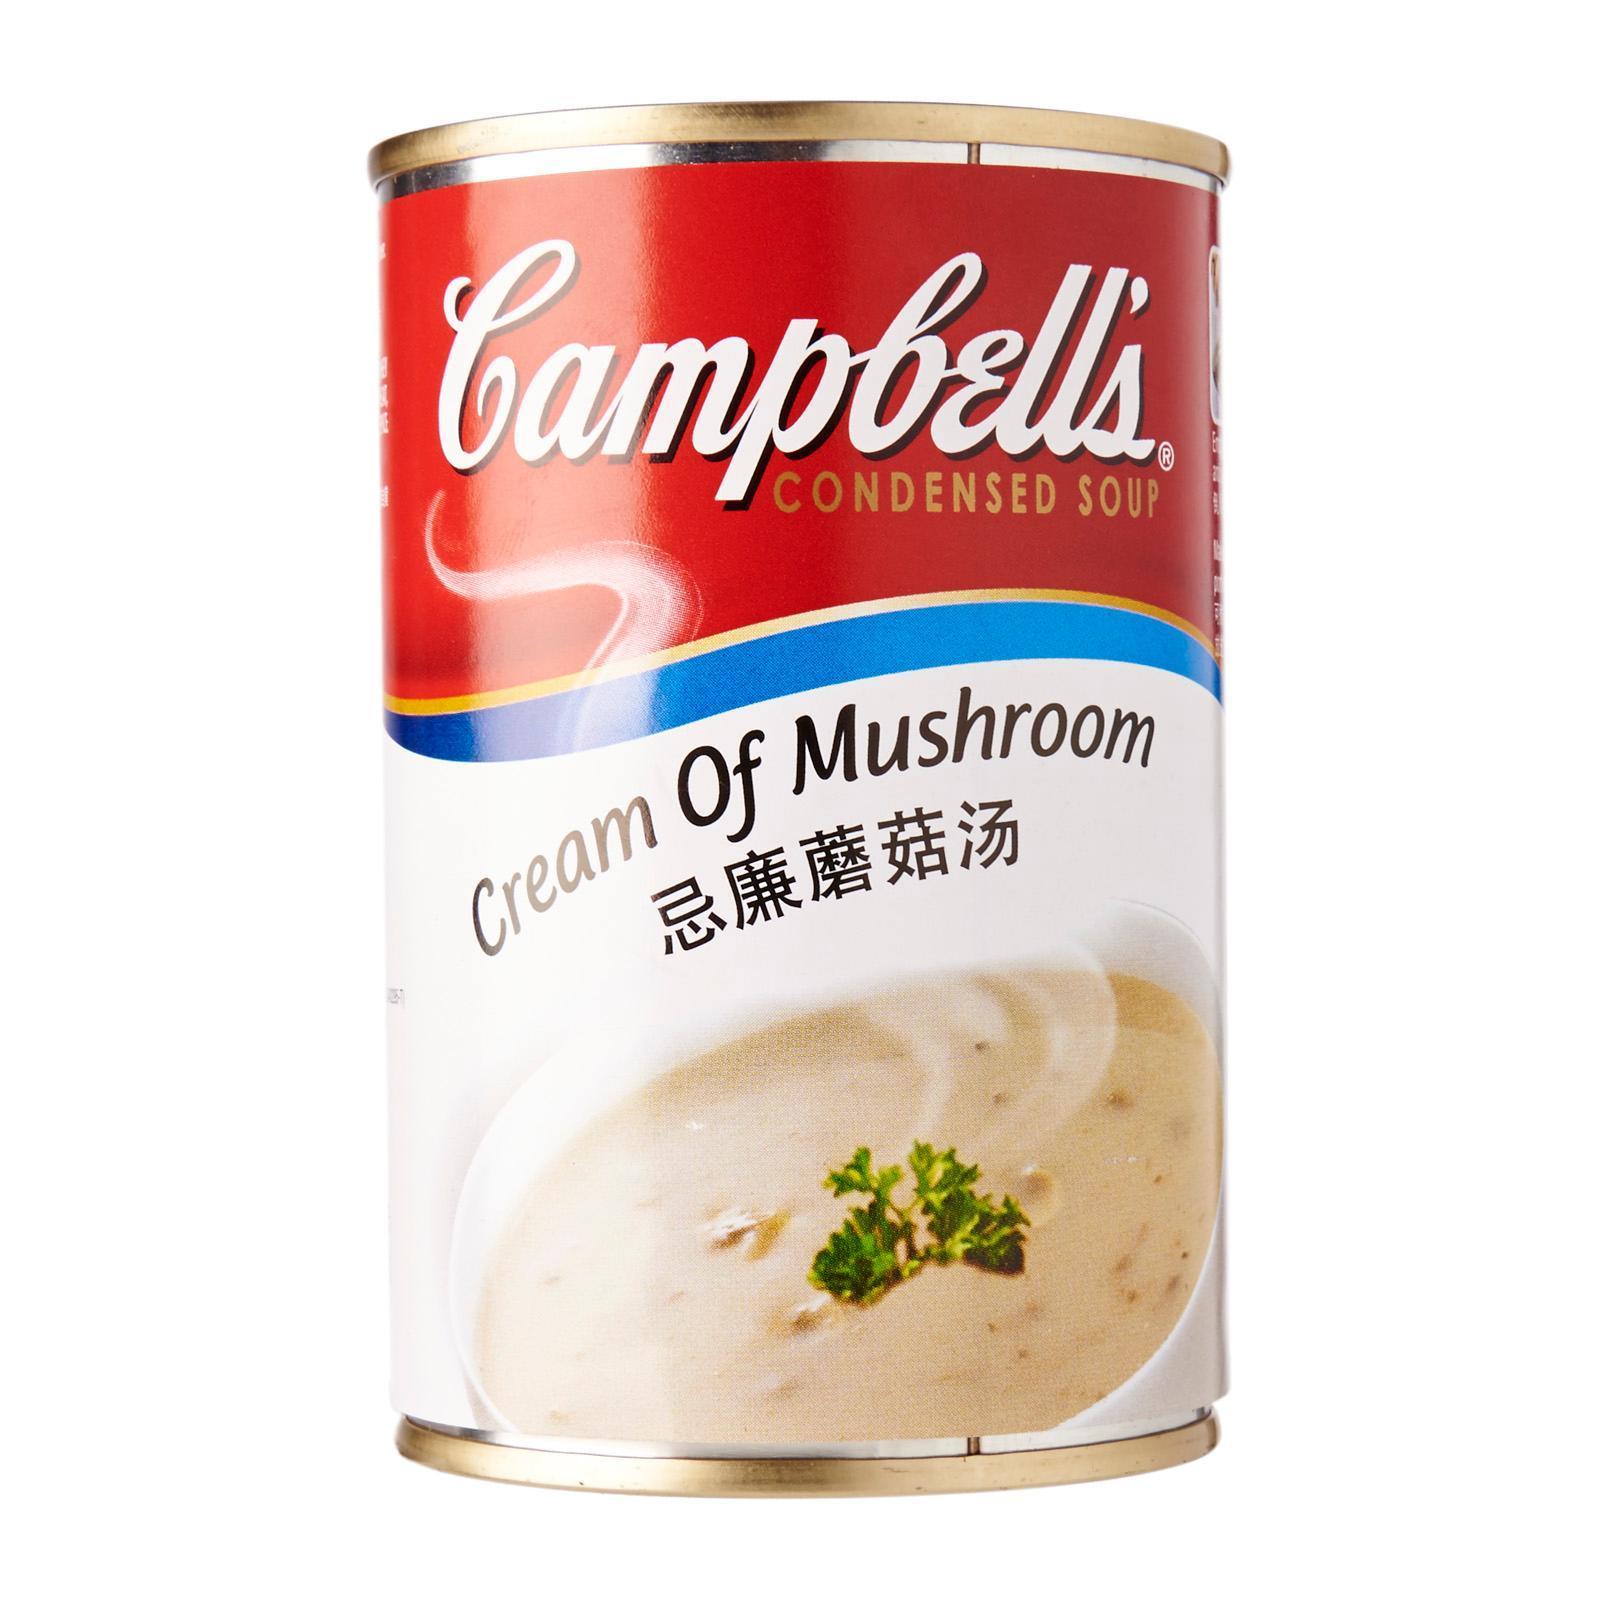 Campbells Cream Of Mushroom Condensed Soup By Redmart.